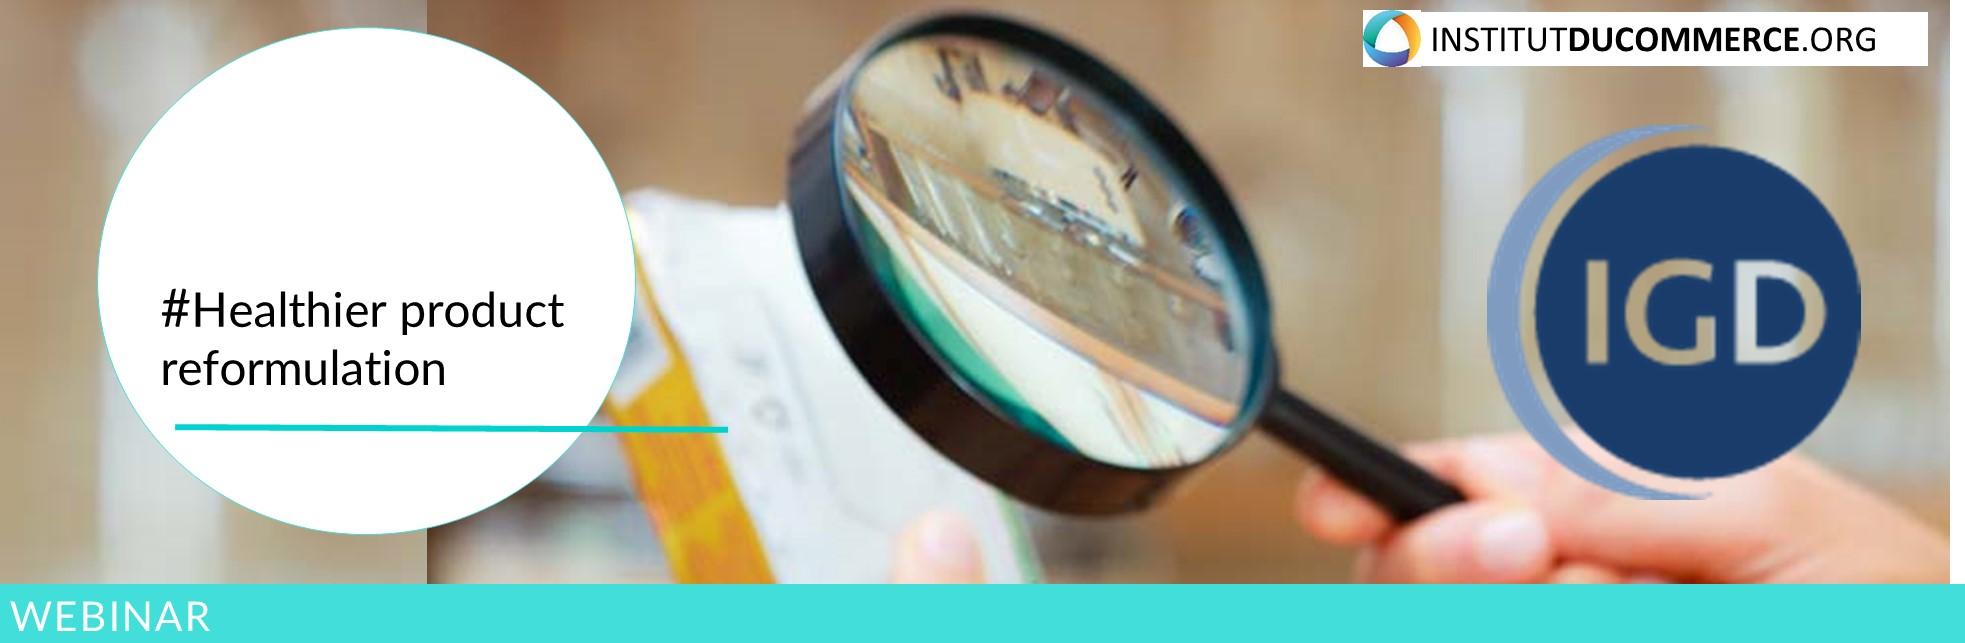 Webinar IGD : Healthier product reformulation